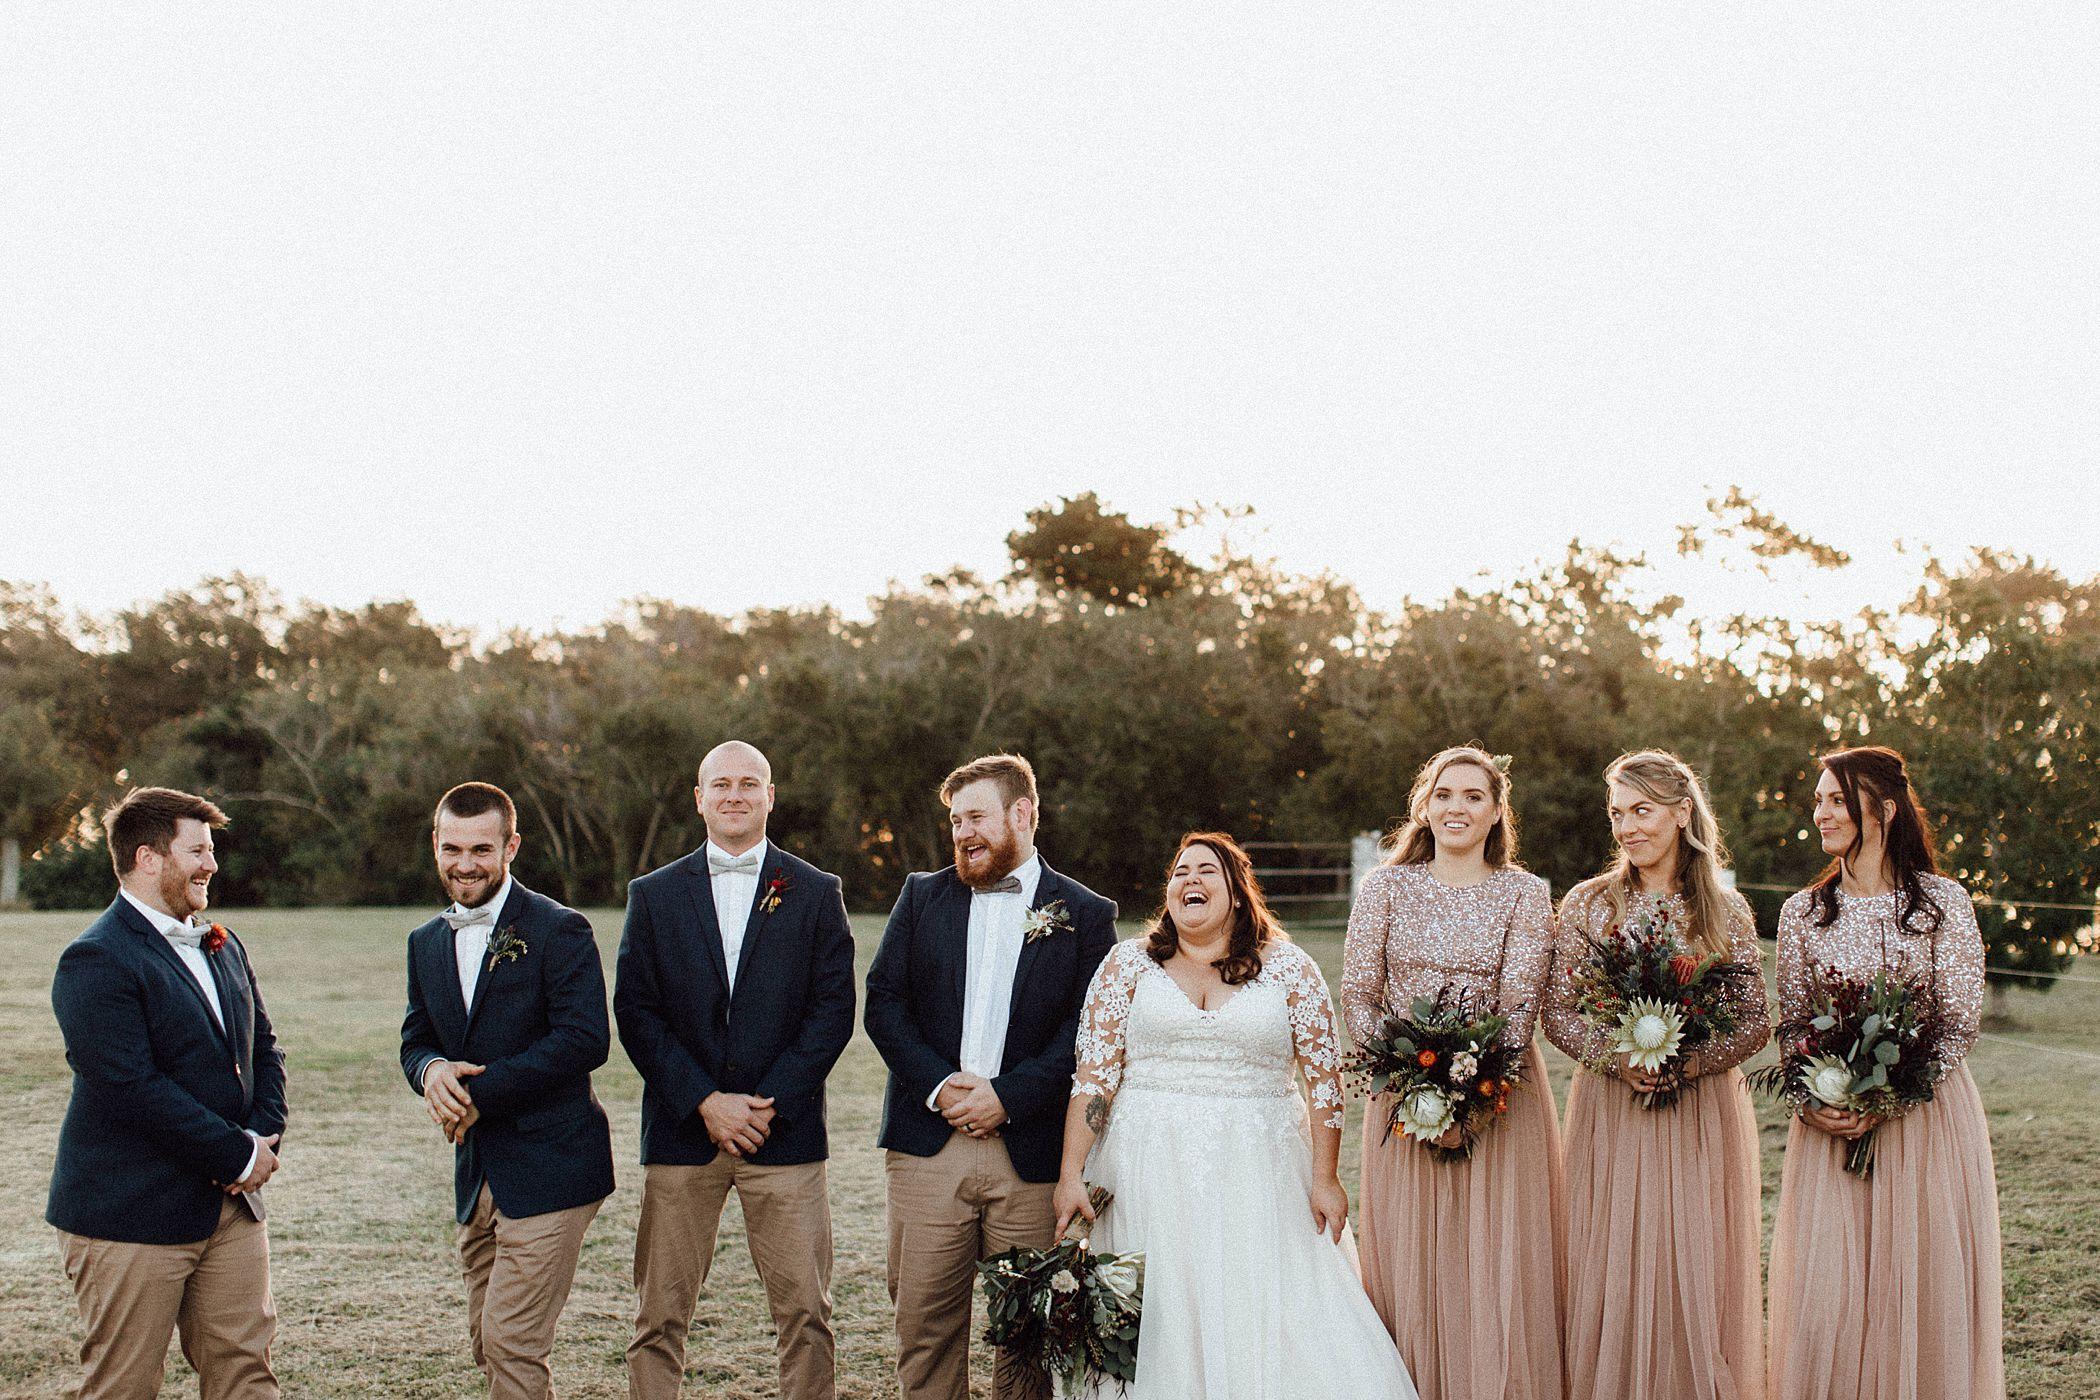 lauren-anne-photography-newcastle-hunter-valley-wedding-photographer_1220.jpg